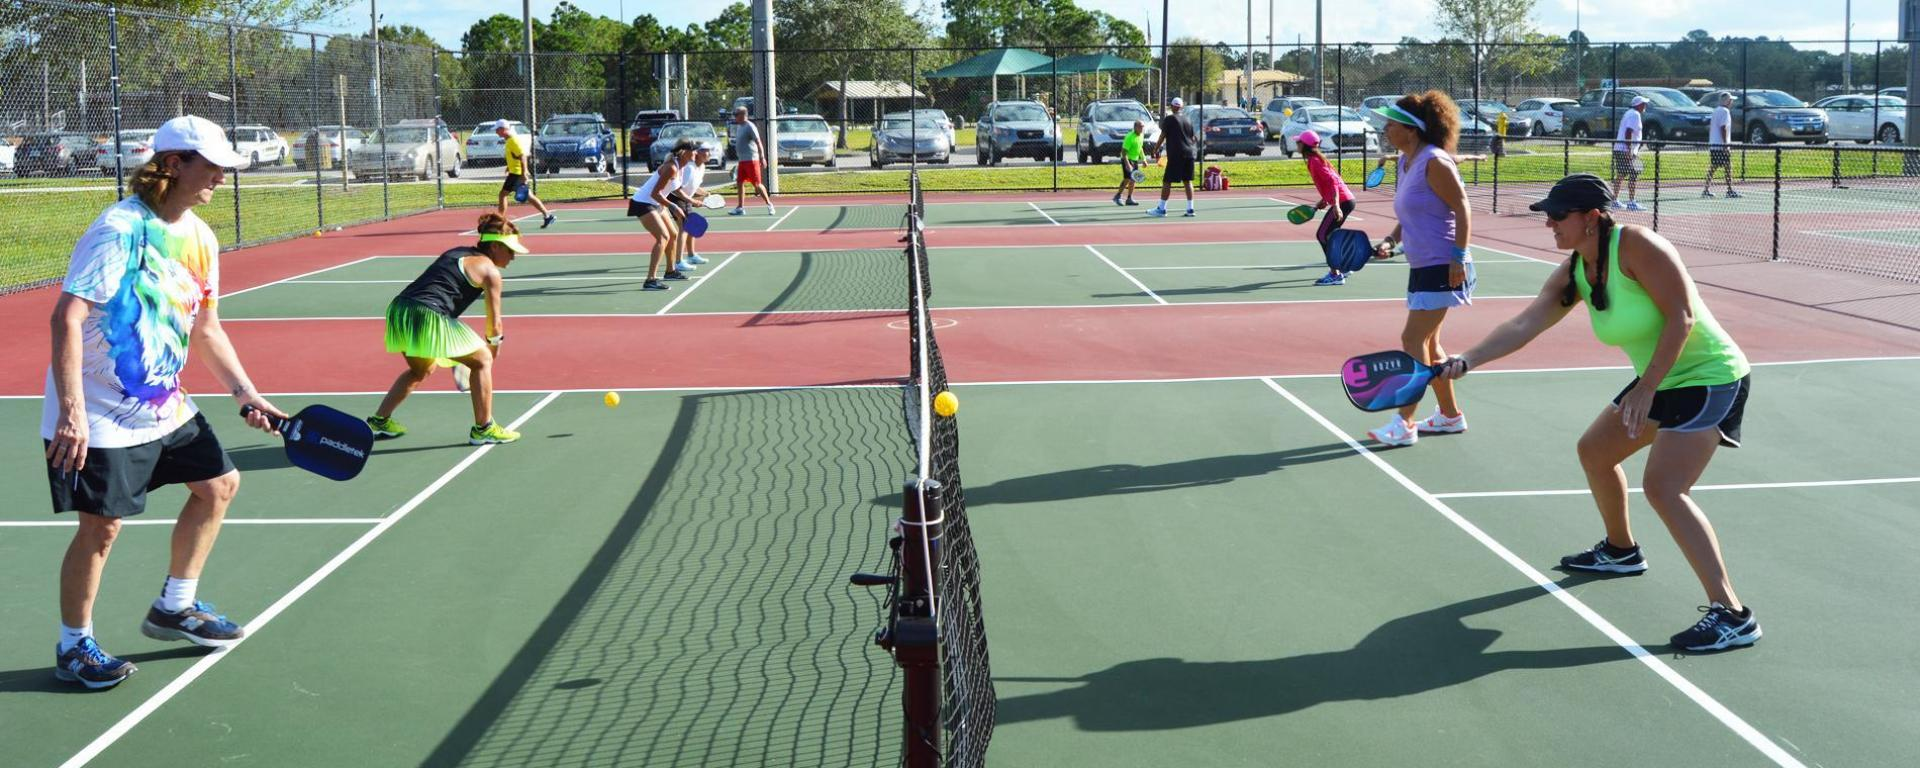 Martin County Senior Games participants playing pickleball.